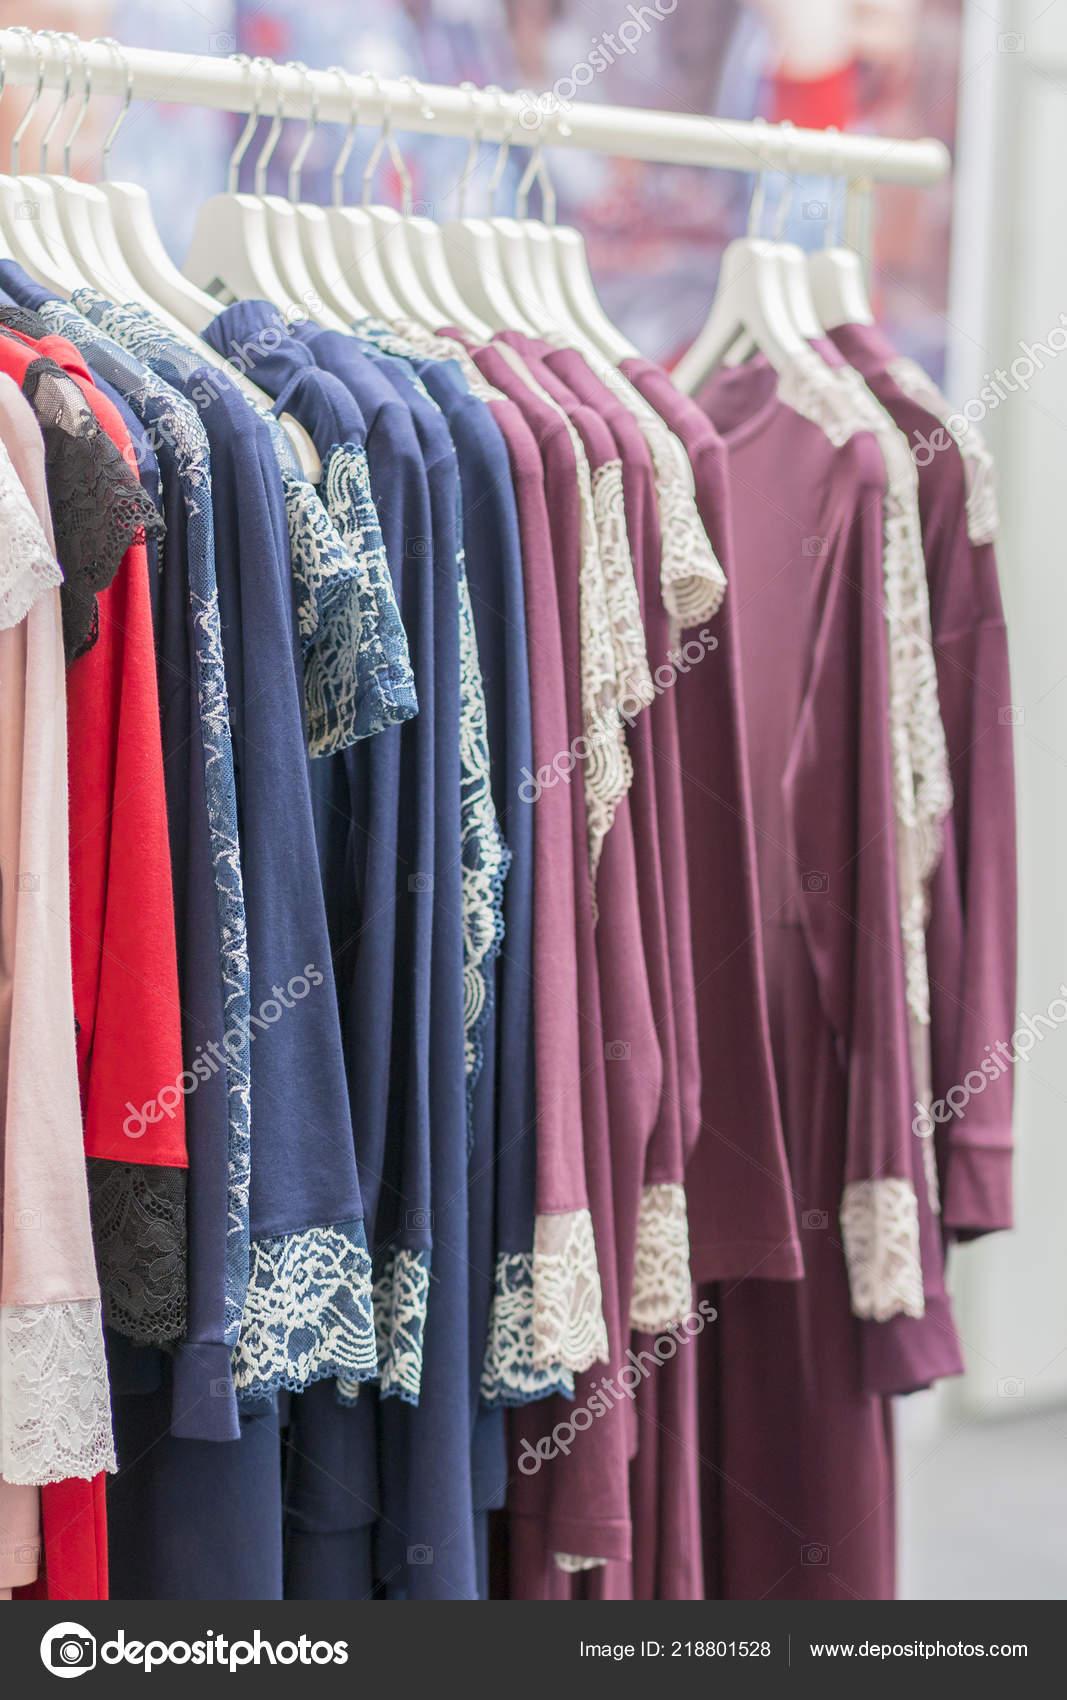 Dames Kleding Winkel.Kleding Verkoopt Concept Dames Pyjama Op Hangers In Kleding Winkel